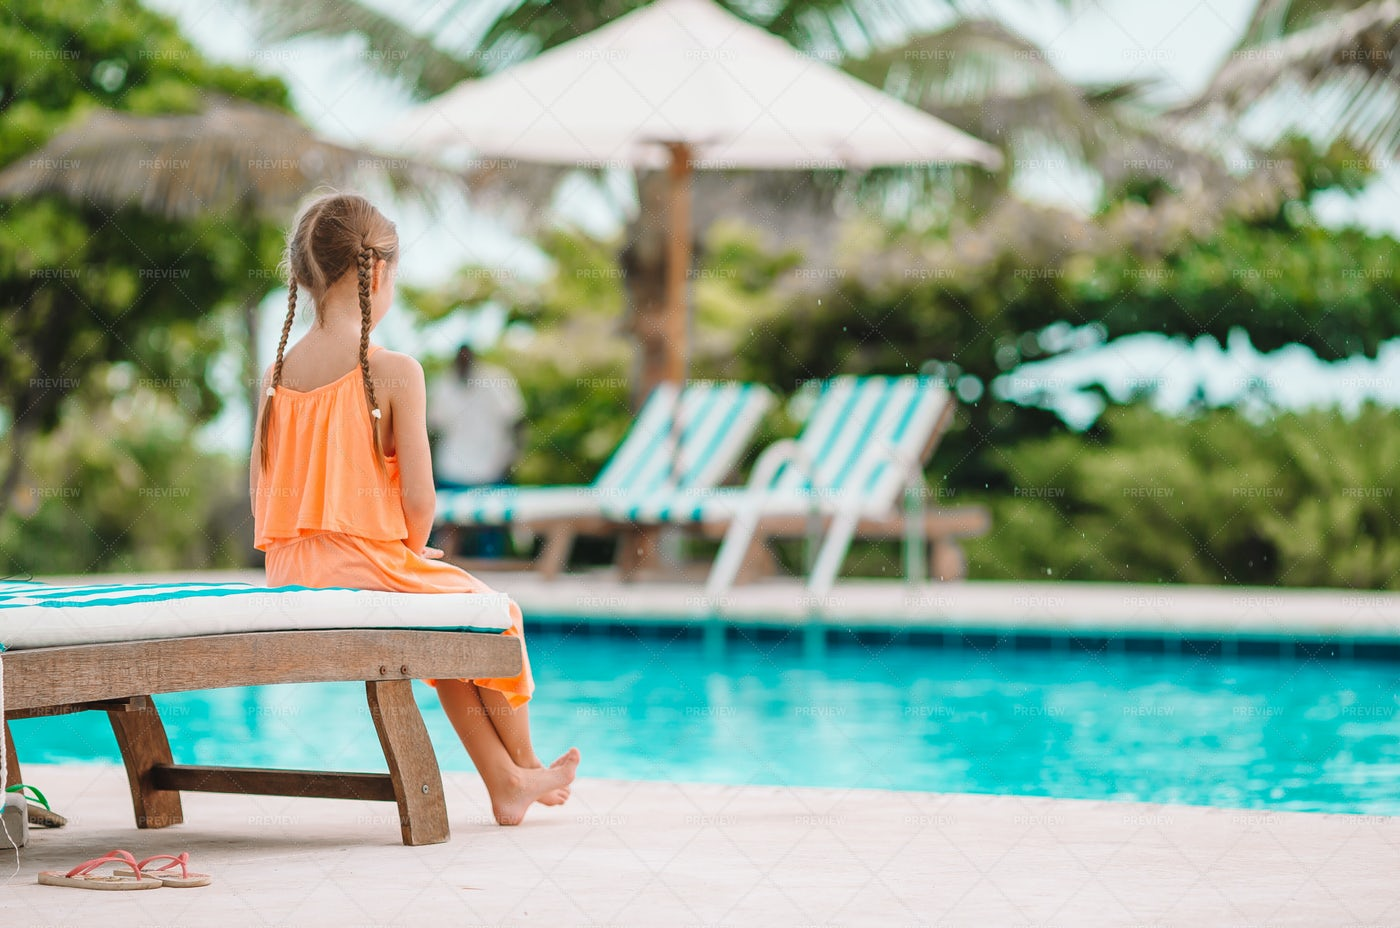 Little Girl In Outdoor: Stock Photos